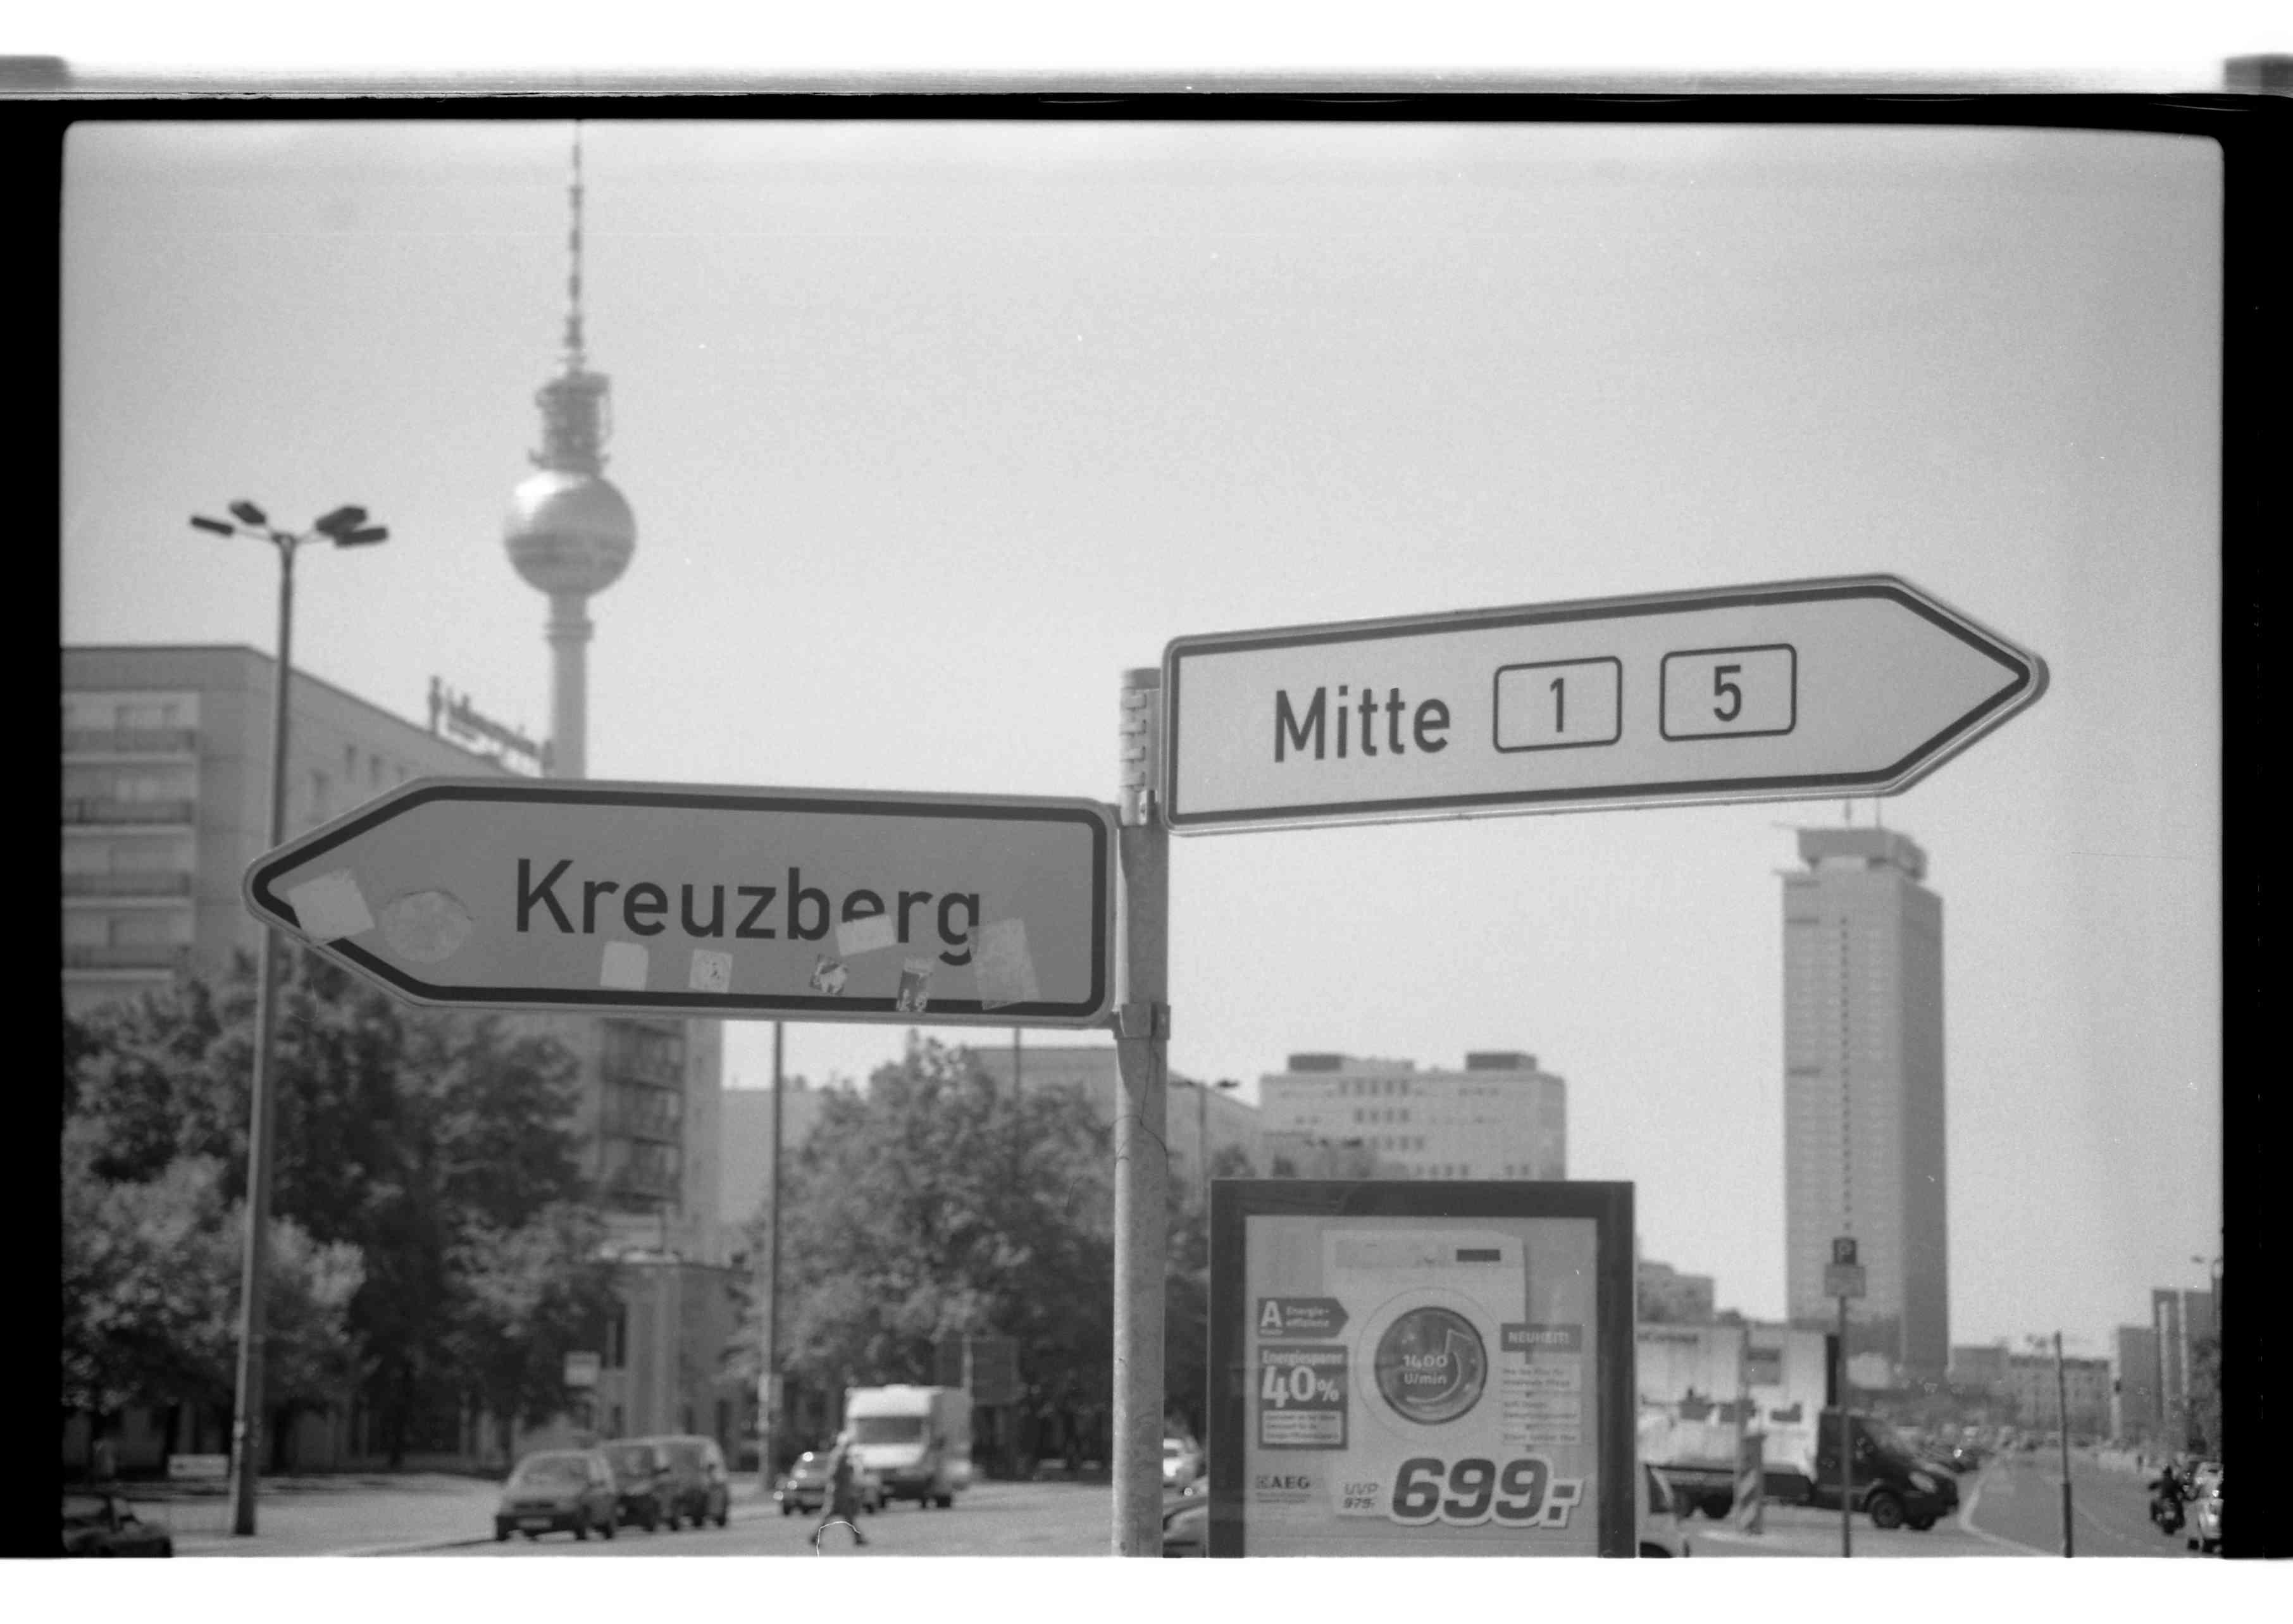 Choisir entre Kreuzberg ou Mitte